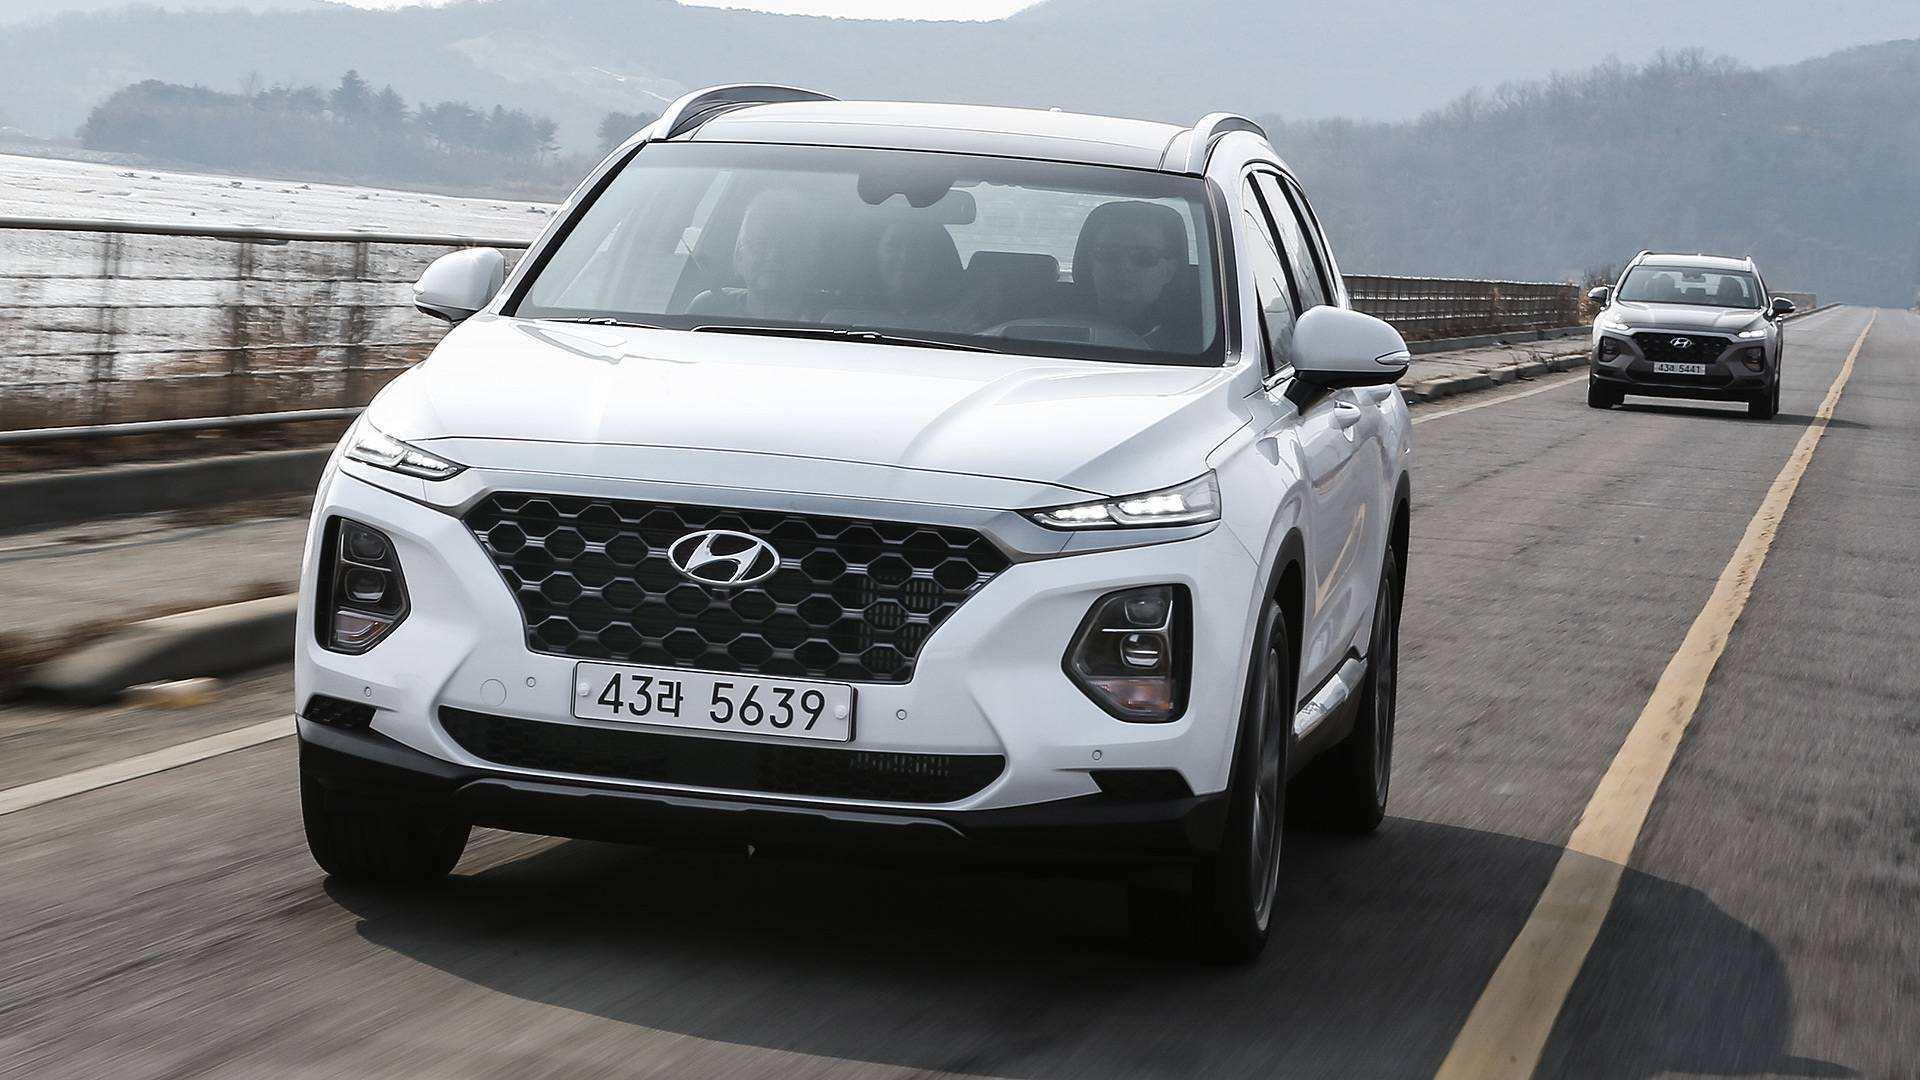 74 Great 2019 Hyundai Santa Fe Launch Prices for 2019 Hyundai Santa Fe Launch